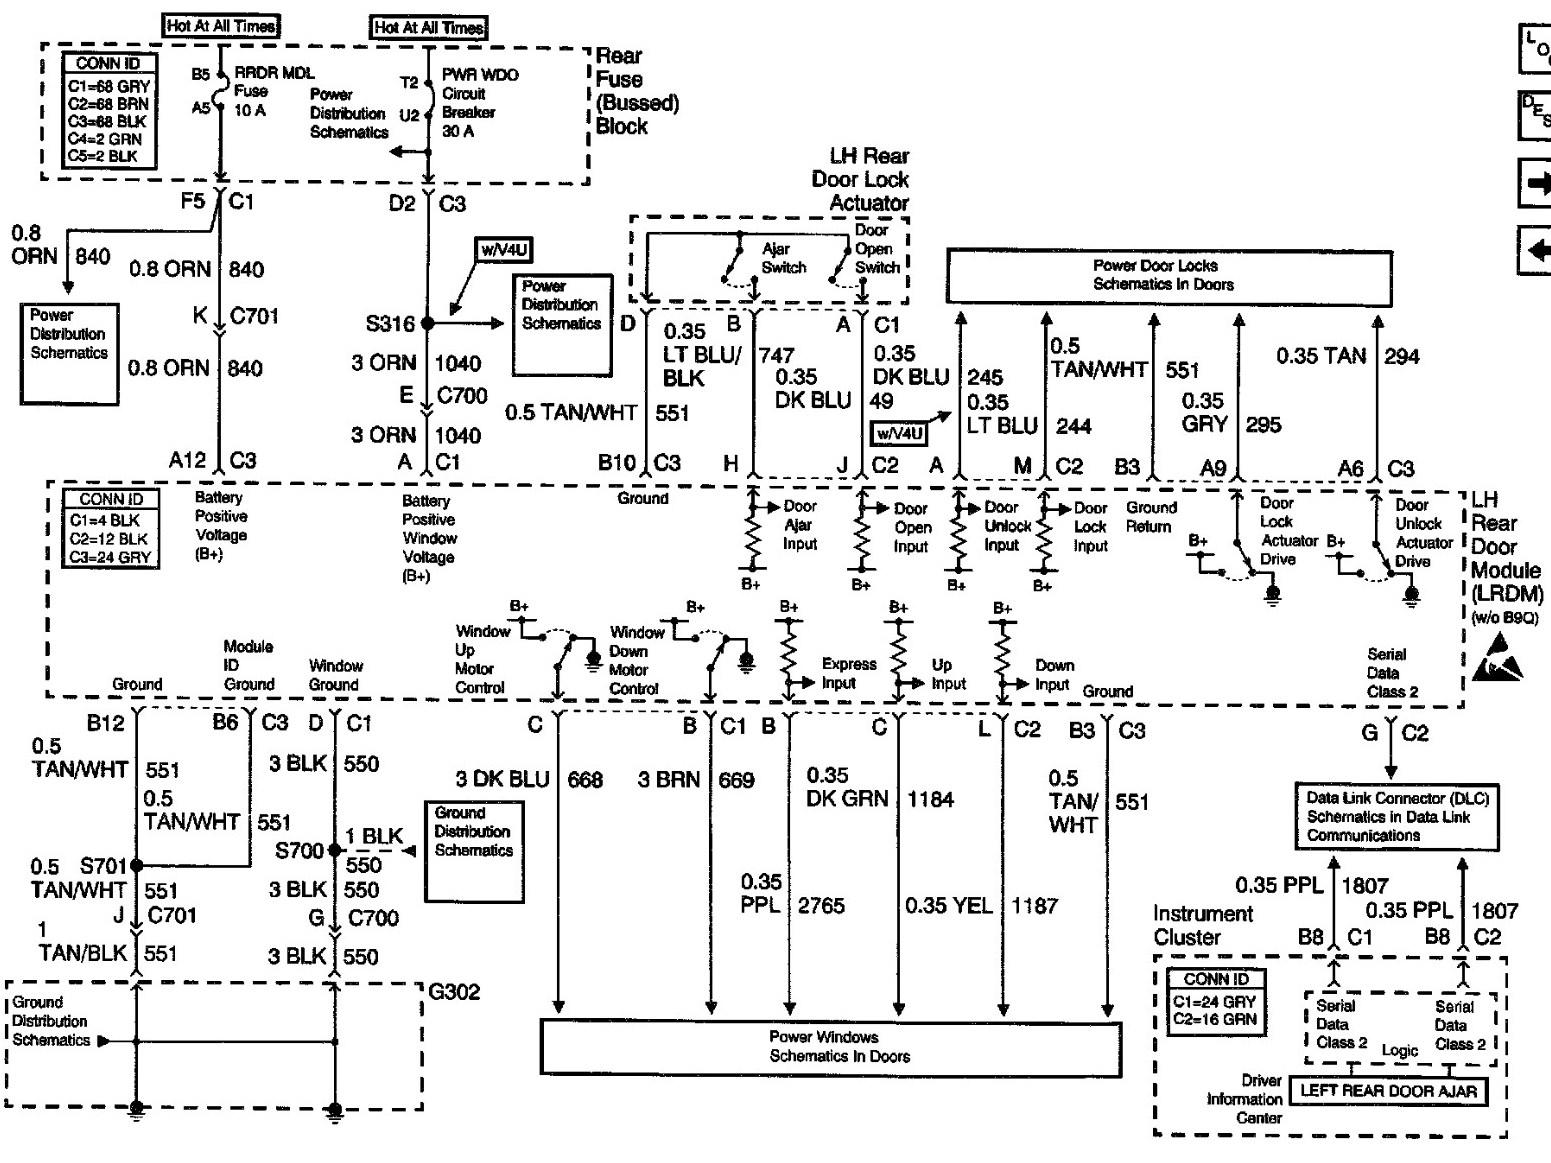 1993 gmc sonoma radio wiring diagram of avian flu 2006 envoy fuse box database under seat diagrams dts